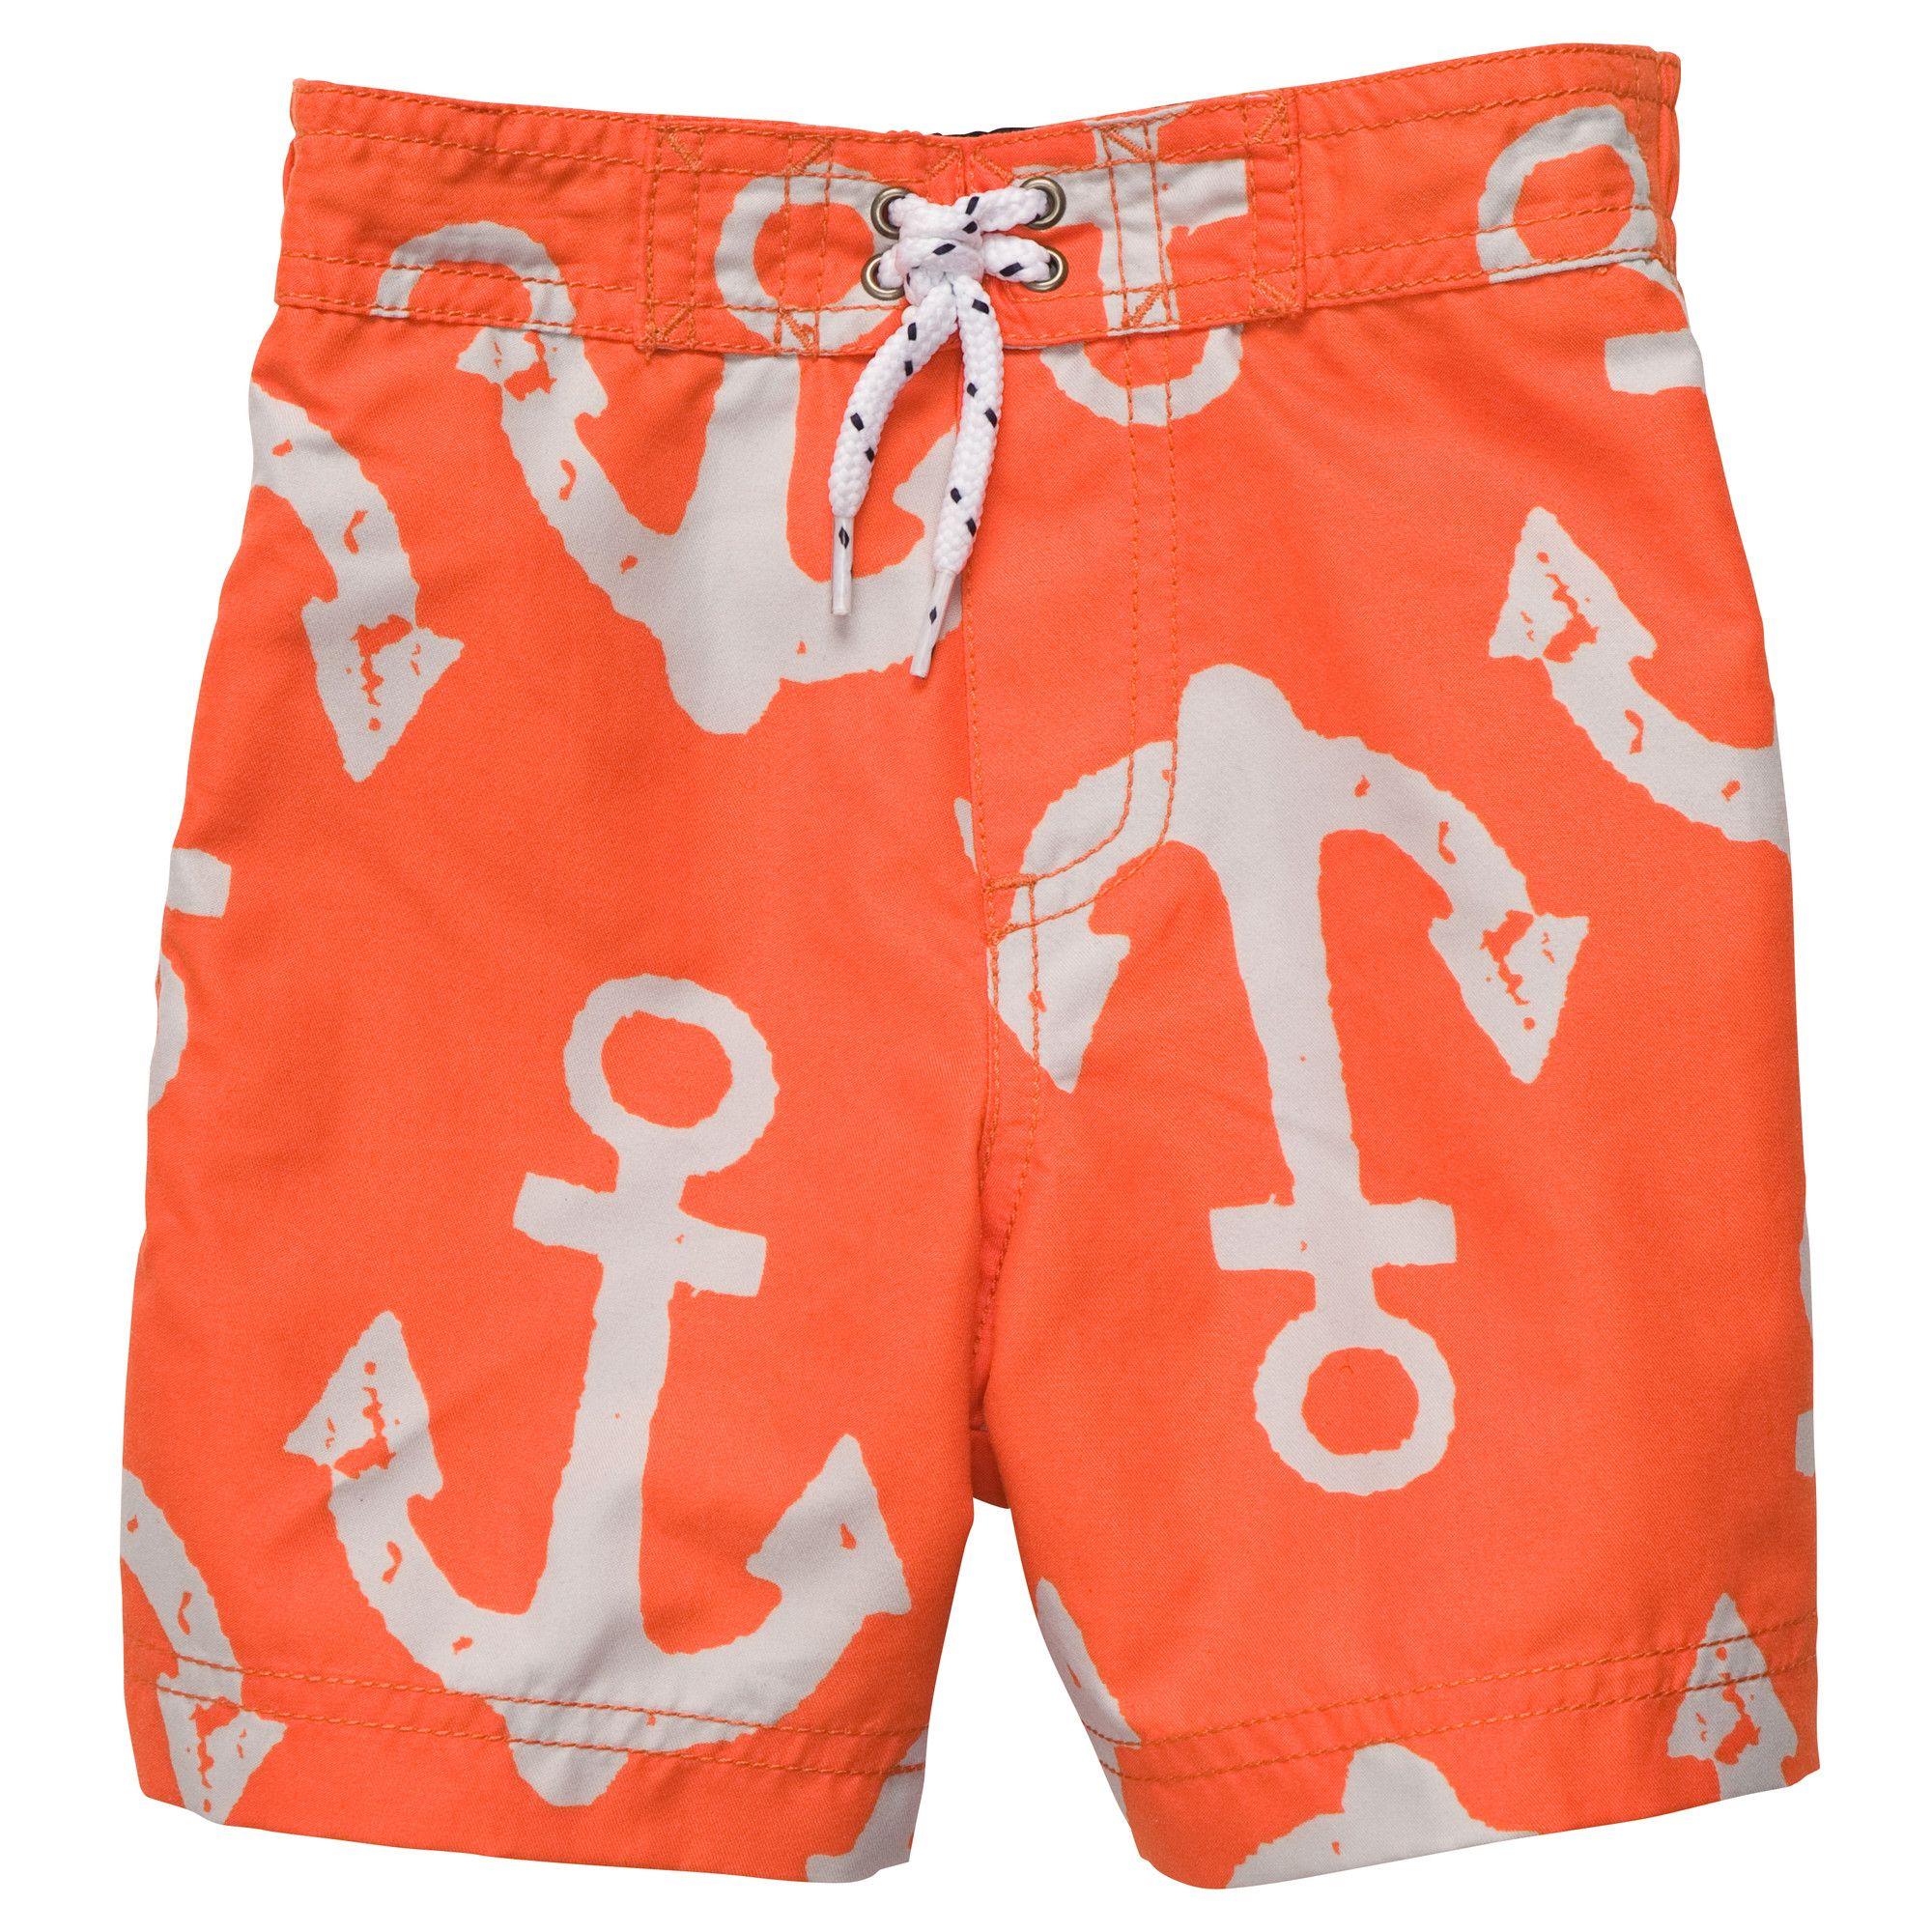 Anchor Print Swim Trunks Toddler Boy Swimwear If Baby J